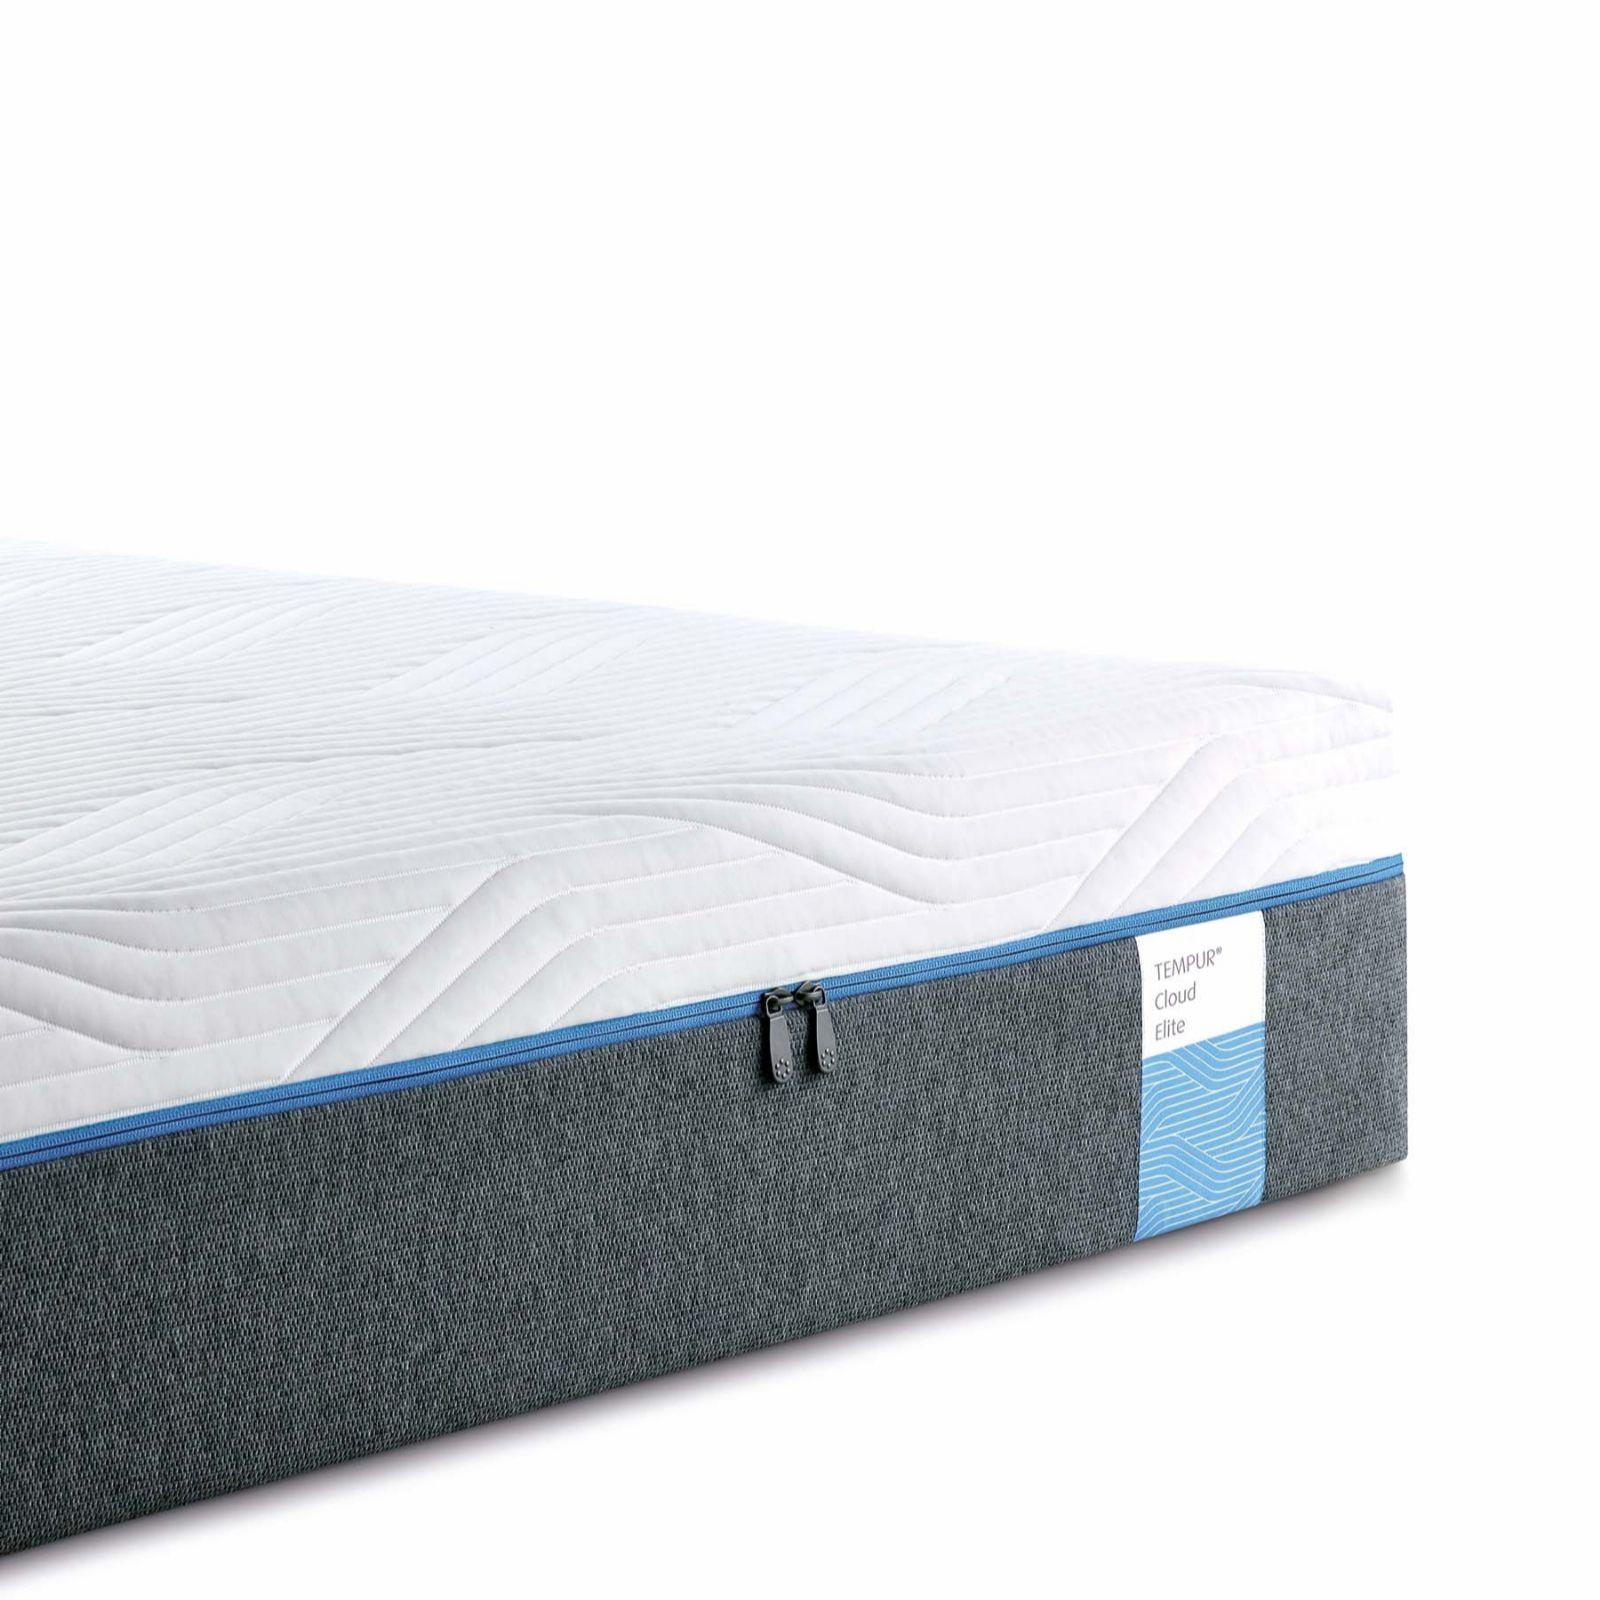 best cheap 40590 2993b Tempur Cloud Elite 25 Mattress - QVC UK